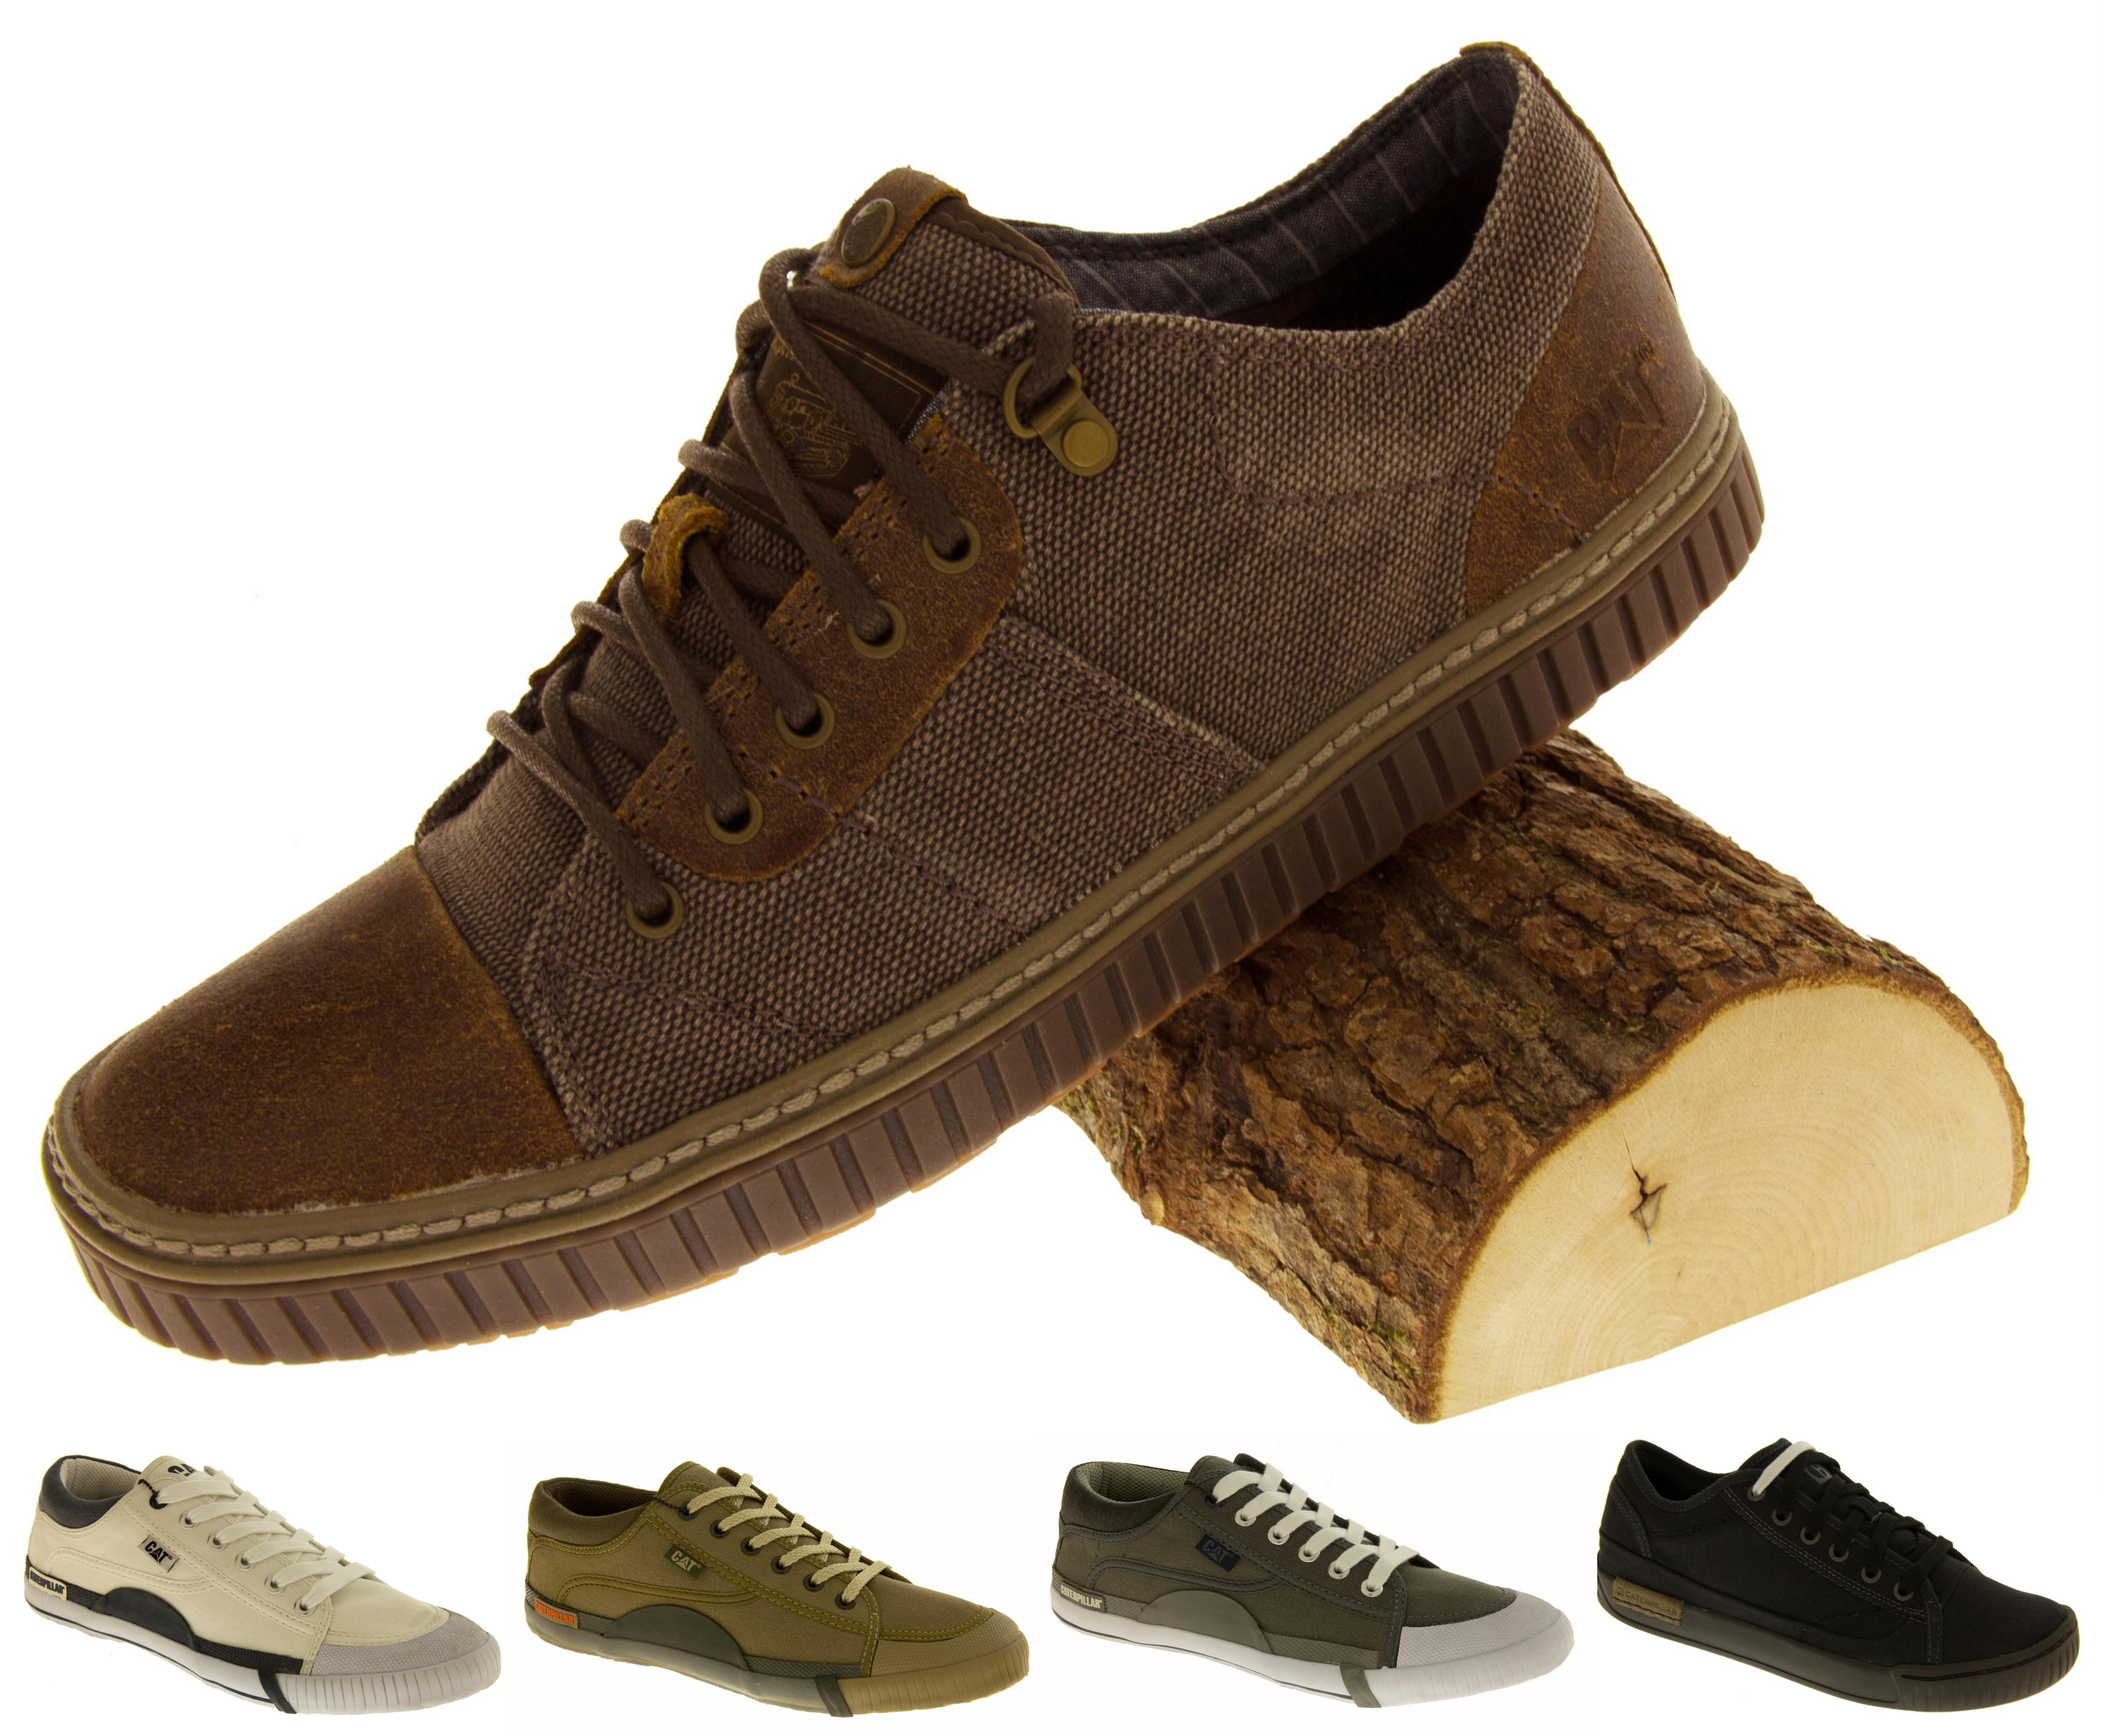 7f2c8e2c90336c caterpillar chaussure prix maroc